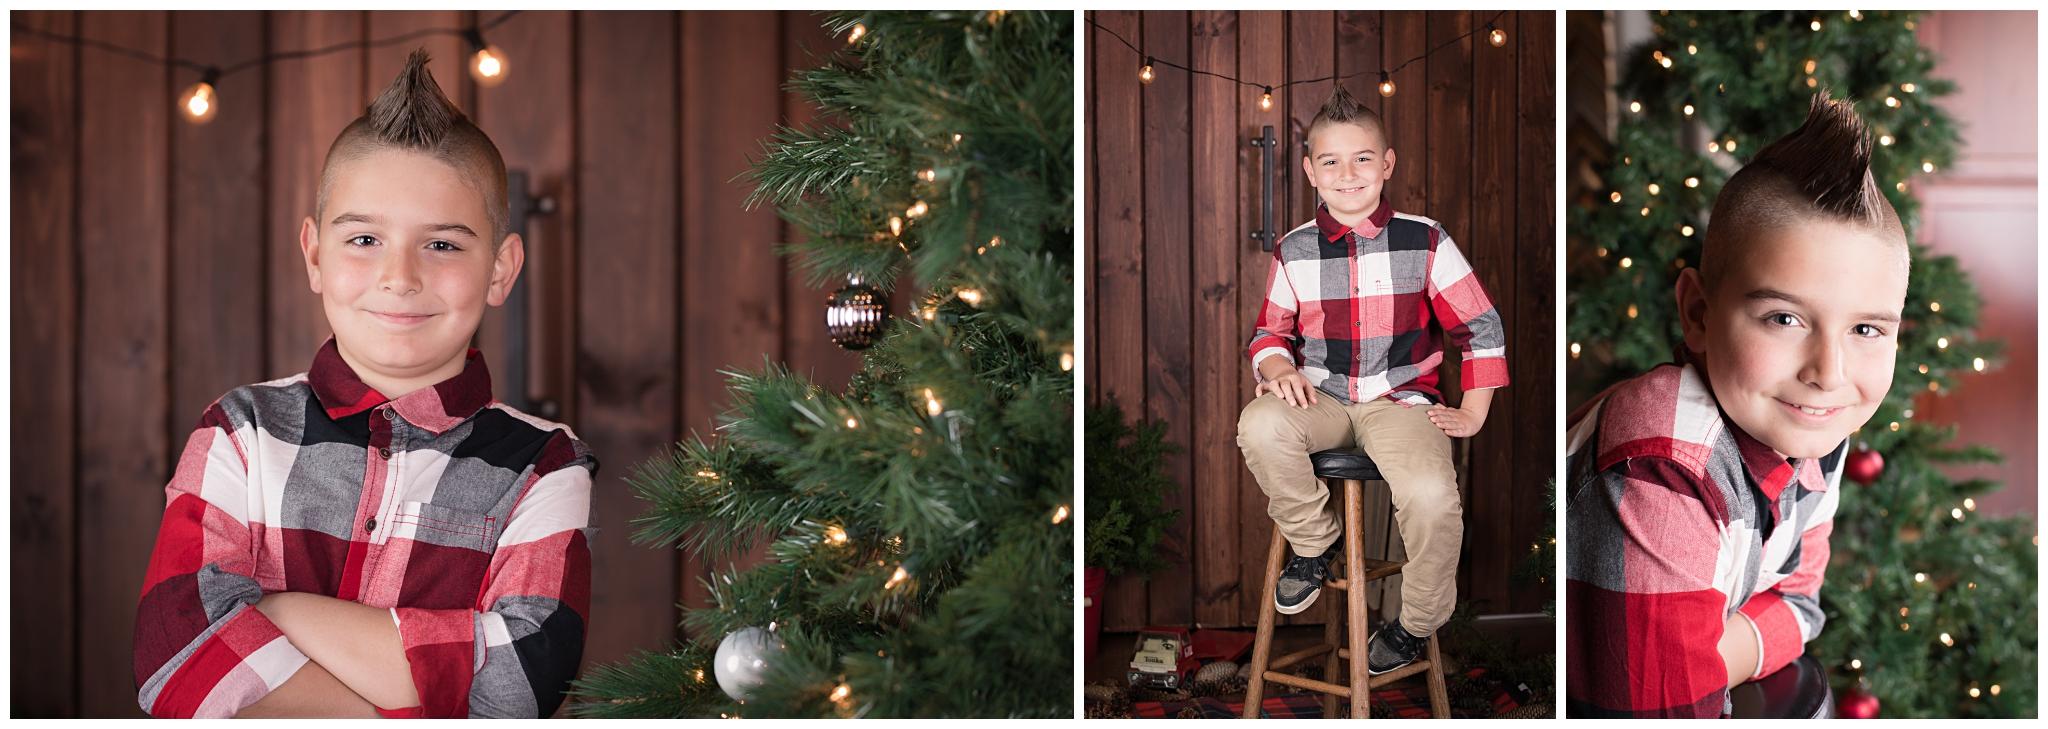 ChristmasMiniSessions_family-baby-kids_Berks-County-Reading-PA_0016.jpg